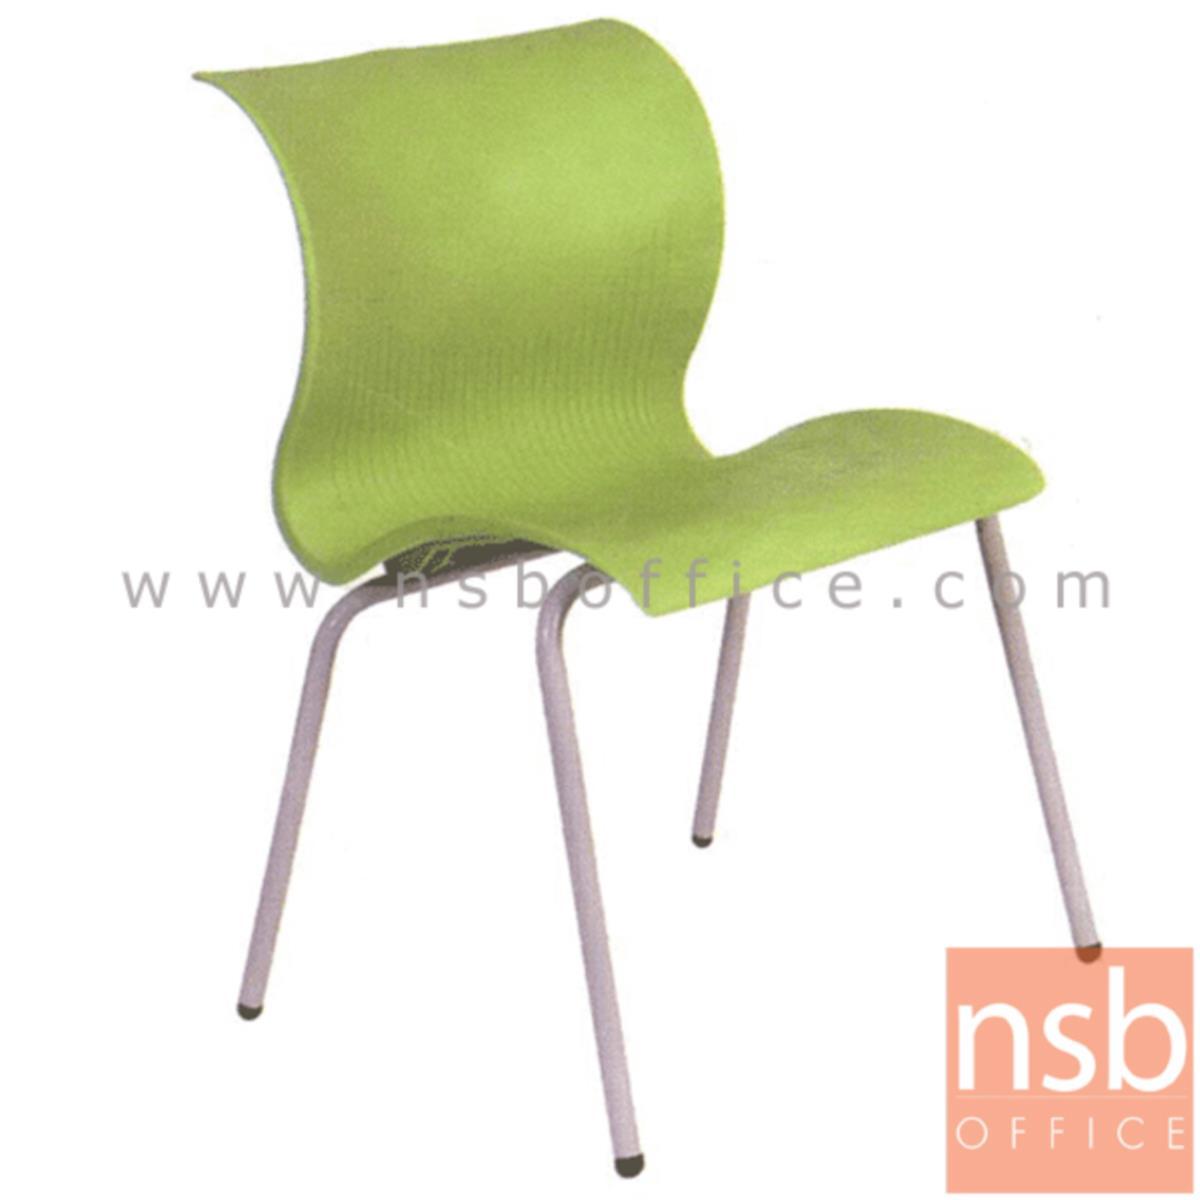 B05A037:เก้าอี้อเนกประสงค์เฟรมโพลี่ รุ่น A301  ขาเหล็ก